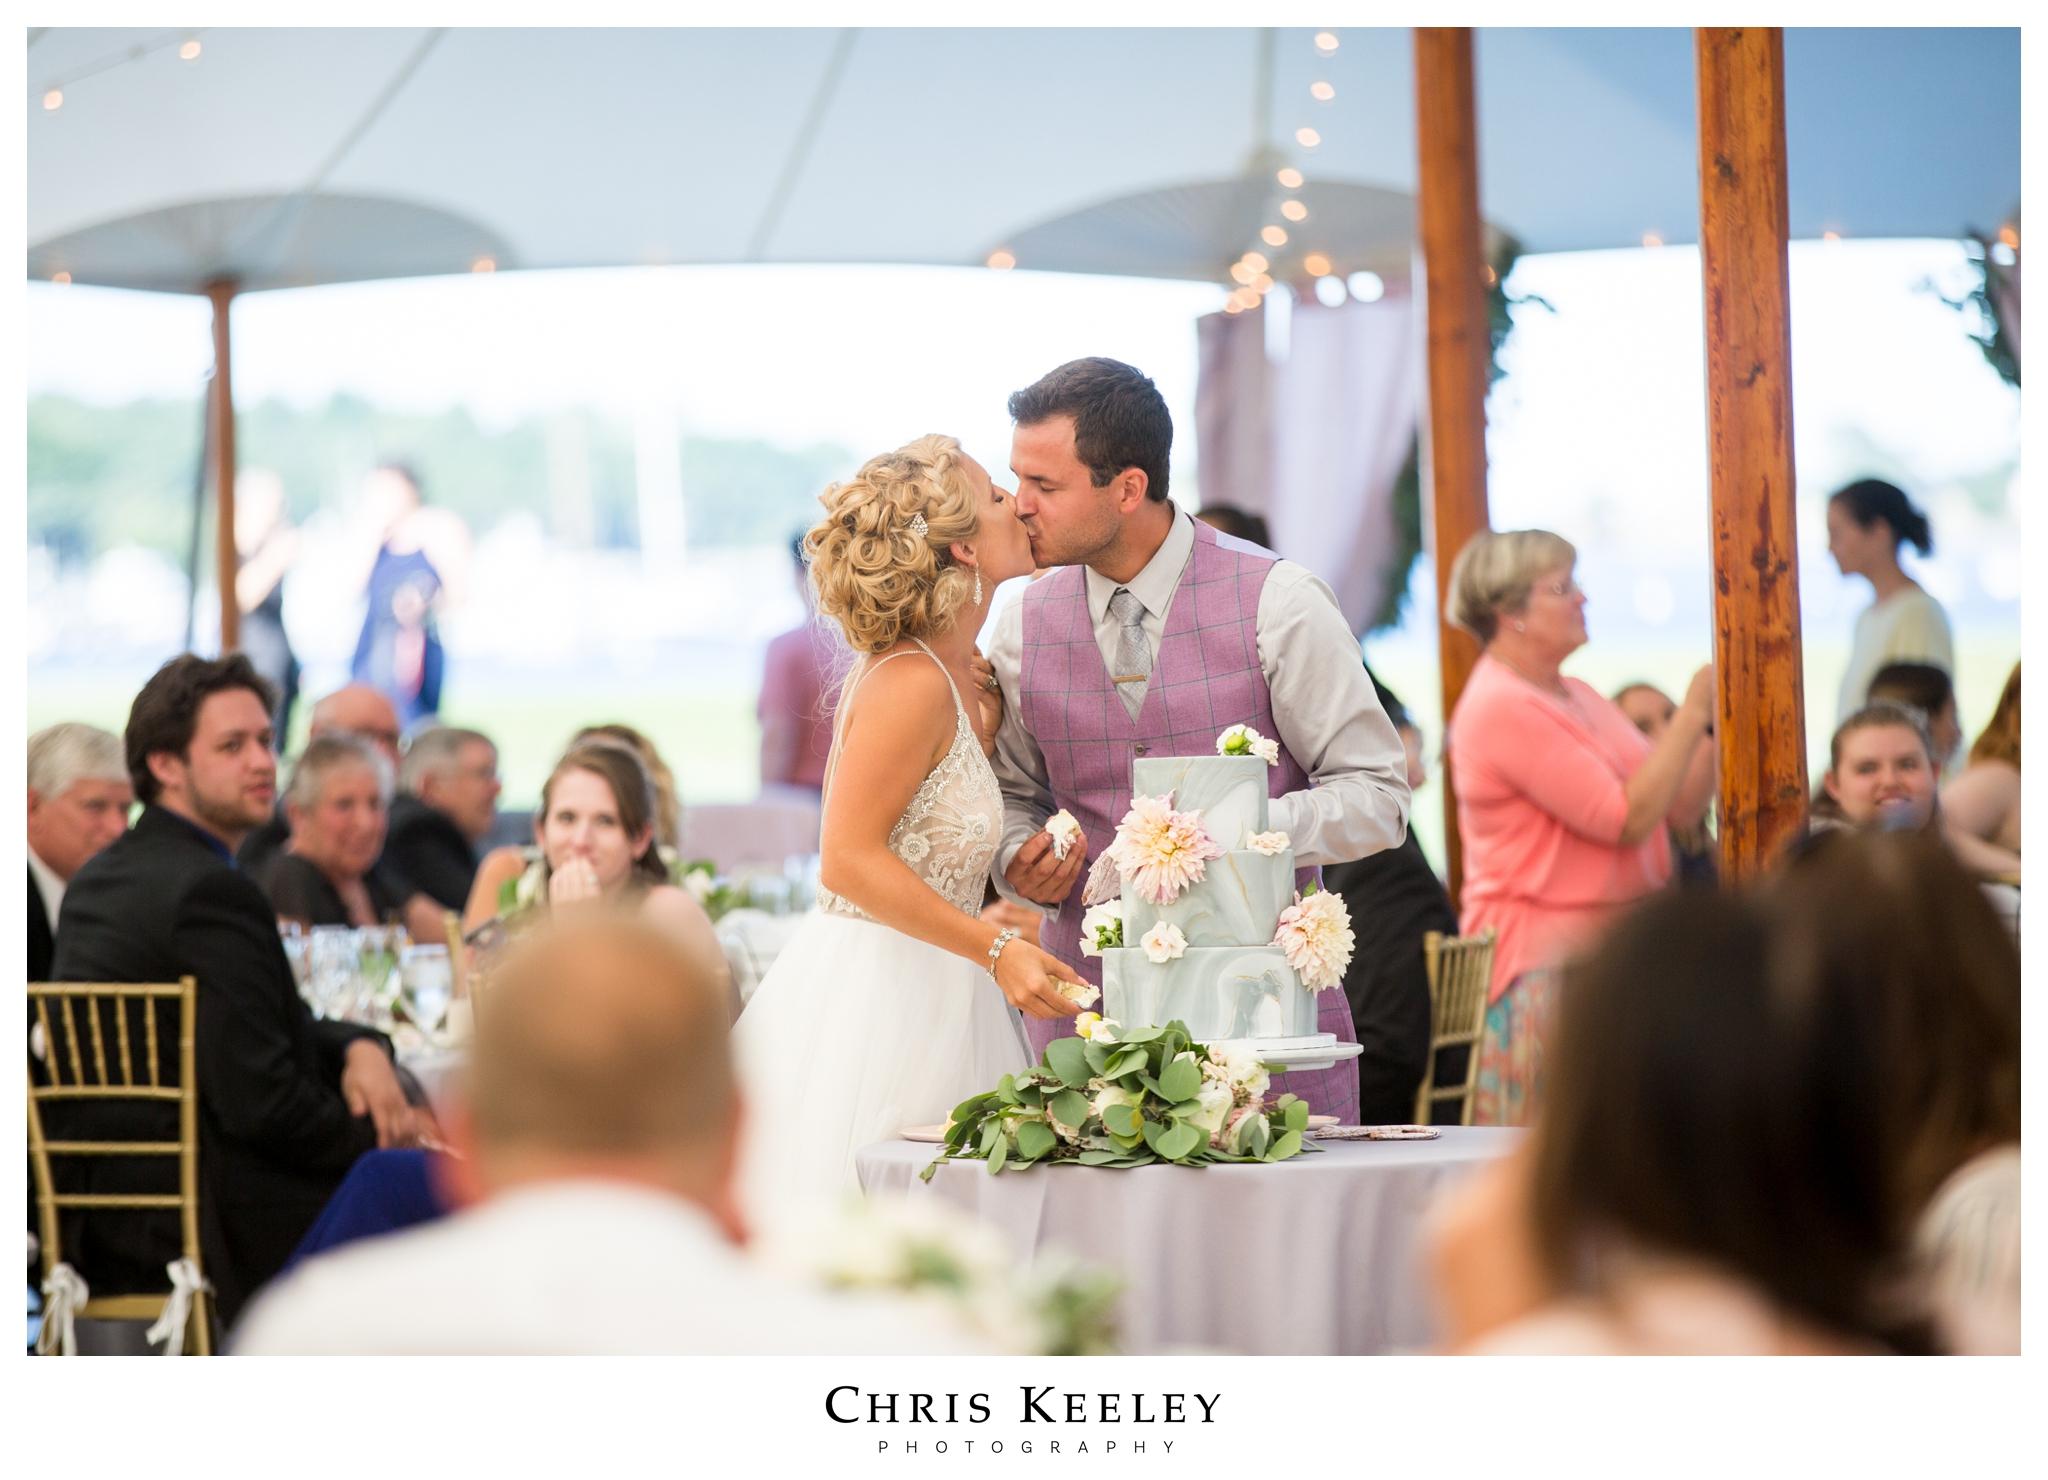 bride-groom-kiss-after-wedding-cake-cut.jpg